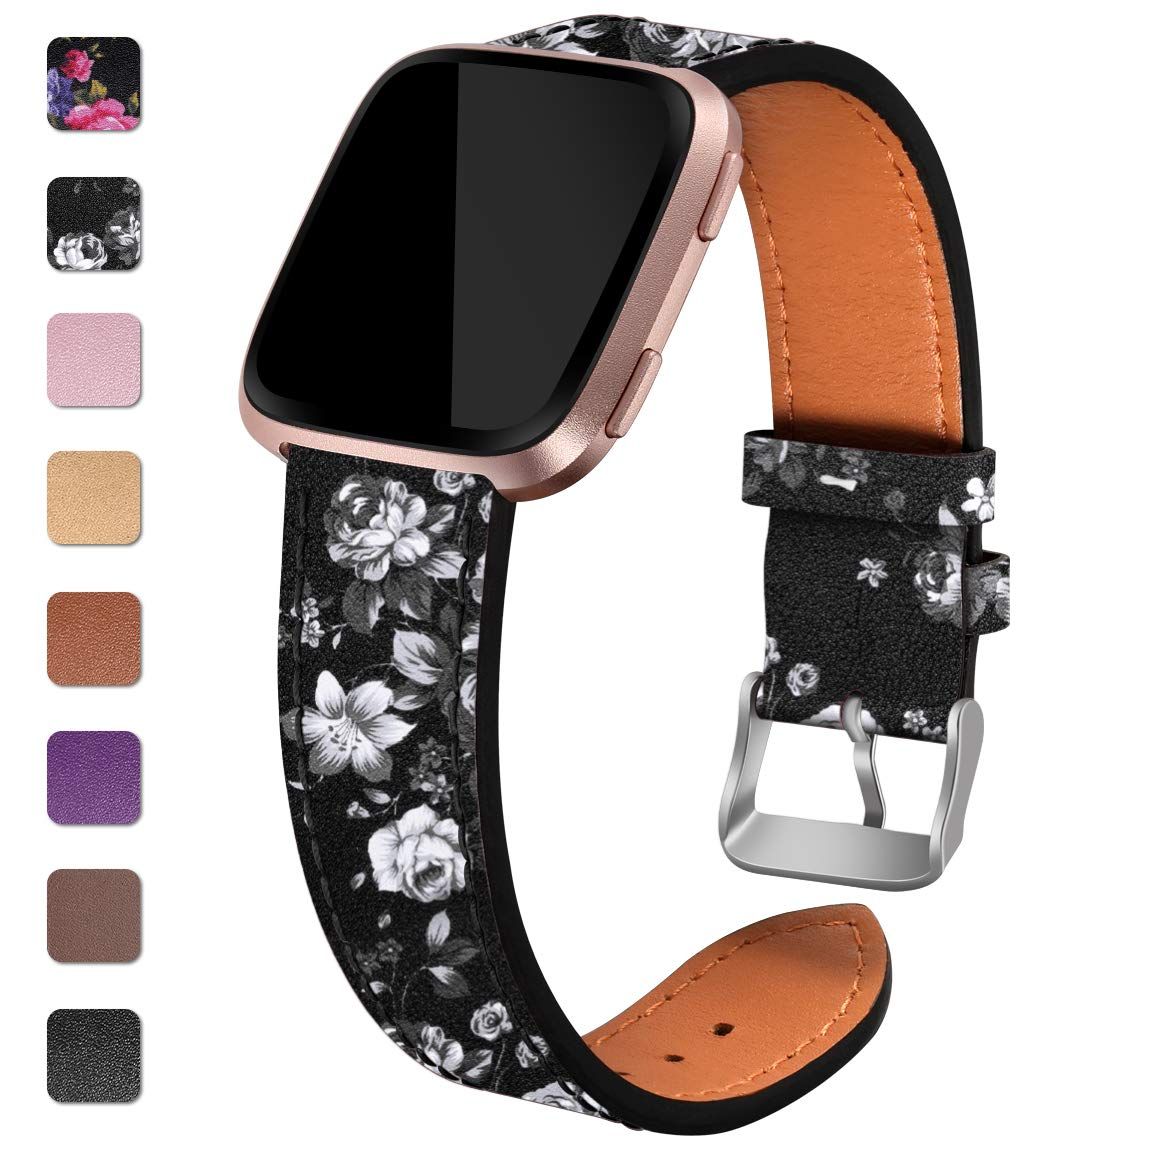 Maledan Replacement Bands Compatible for Fitbit Versa/Versa 2, Versa Lite Edition and Versa Special Edition, Genuine Leather Band Replacement Accessories Strap for Fitbit Versa Smart Watch, Women Men